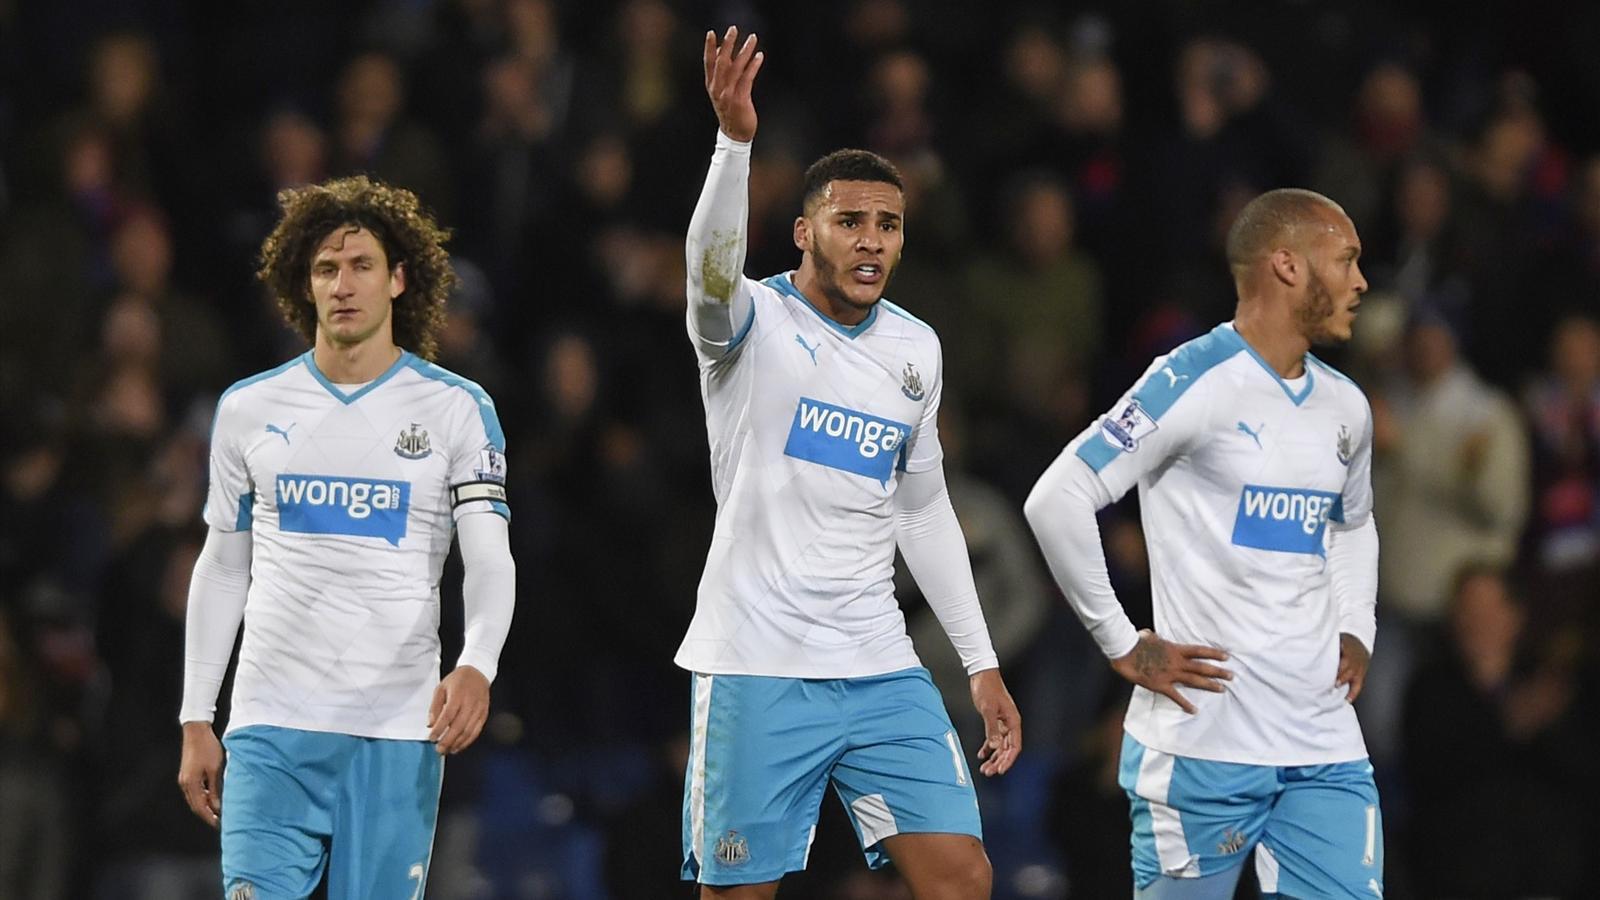 Fabricio Coloccini and his Newcastle team-mates look dejected